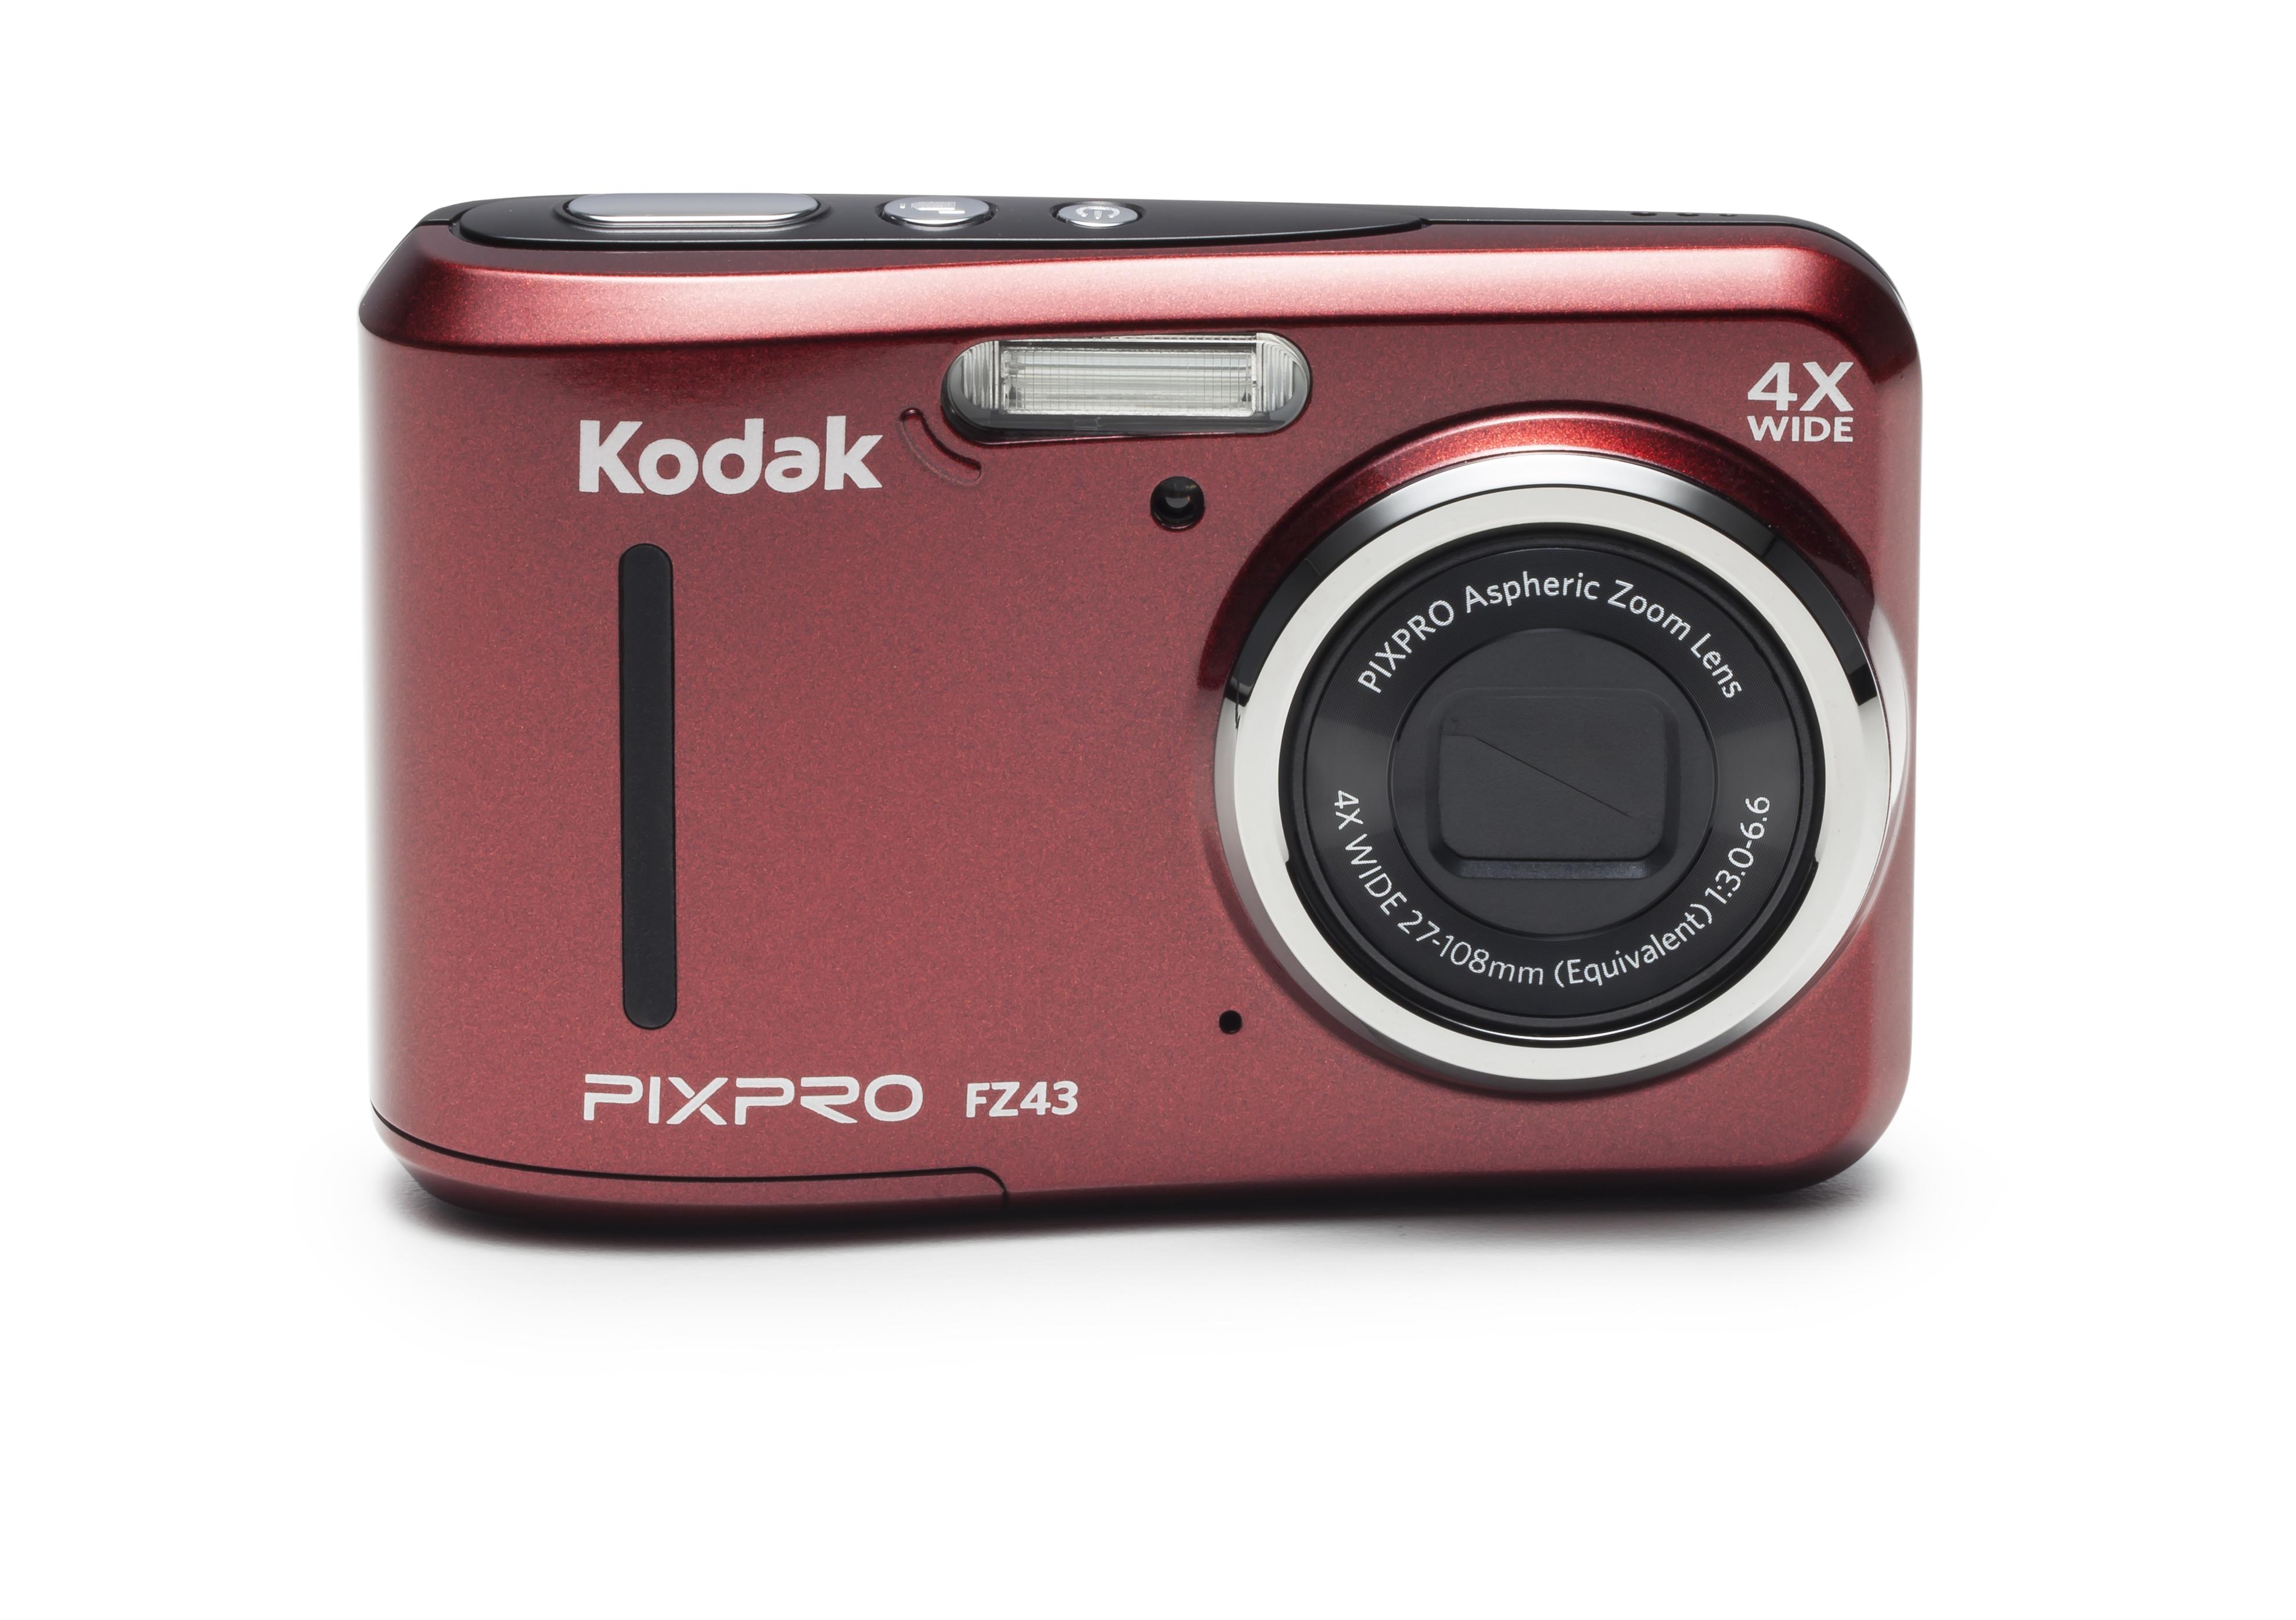 KODAK 16-Megapixel FZ43 Pixpro Compact Digital Still Camera - Red